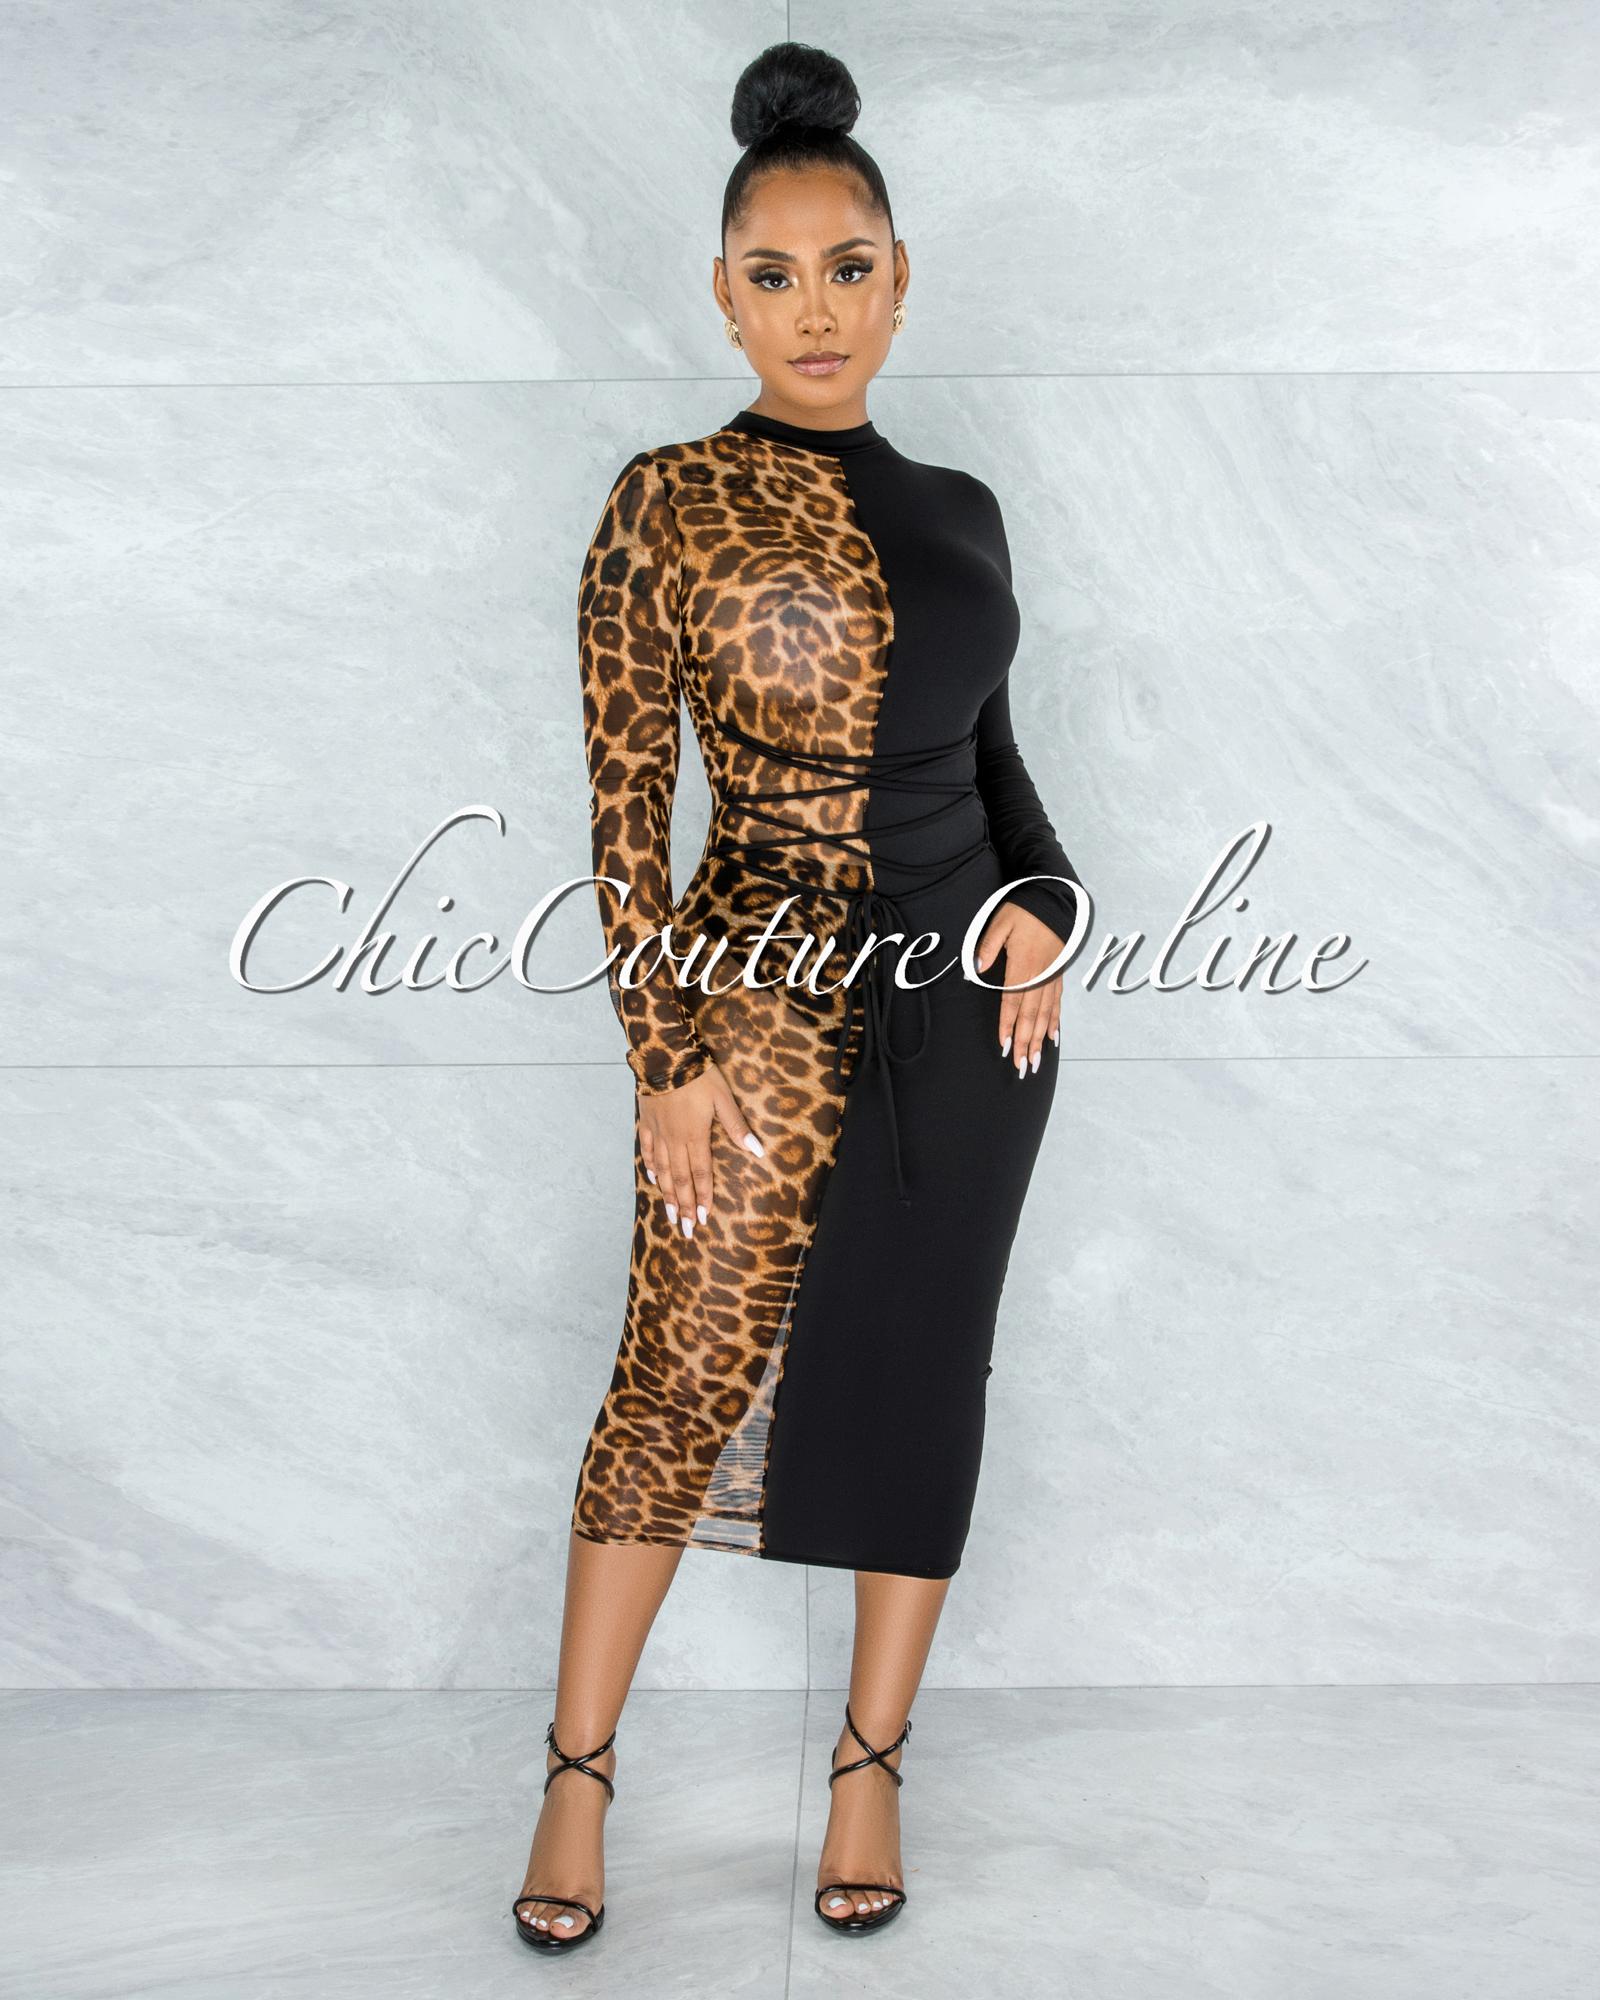 Haji Black Leopard Two-Tones Lace-Up Dress